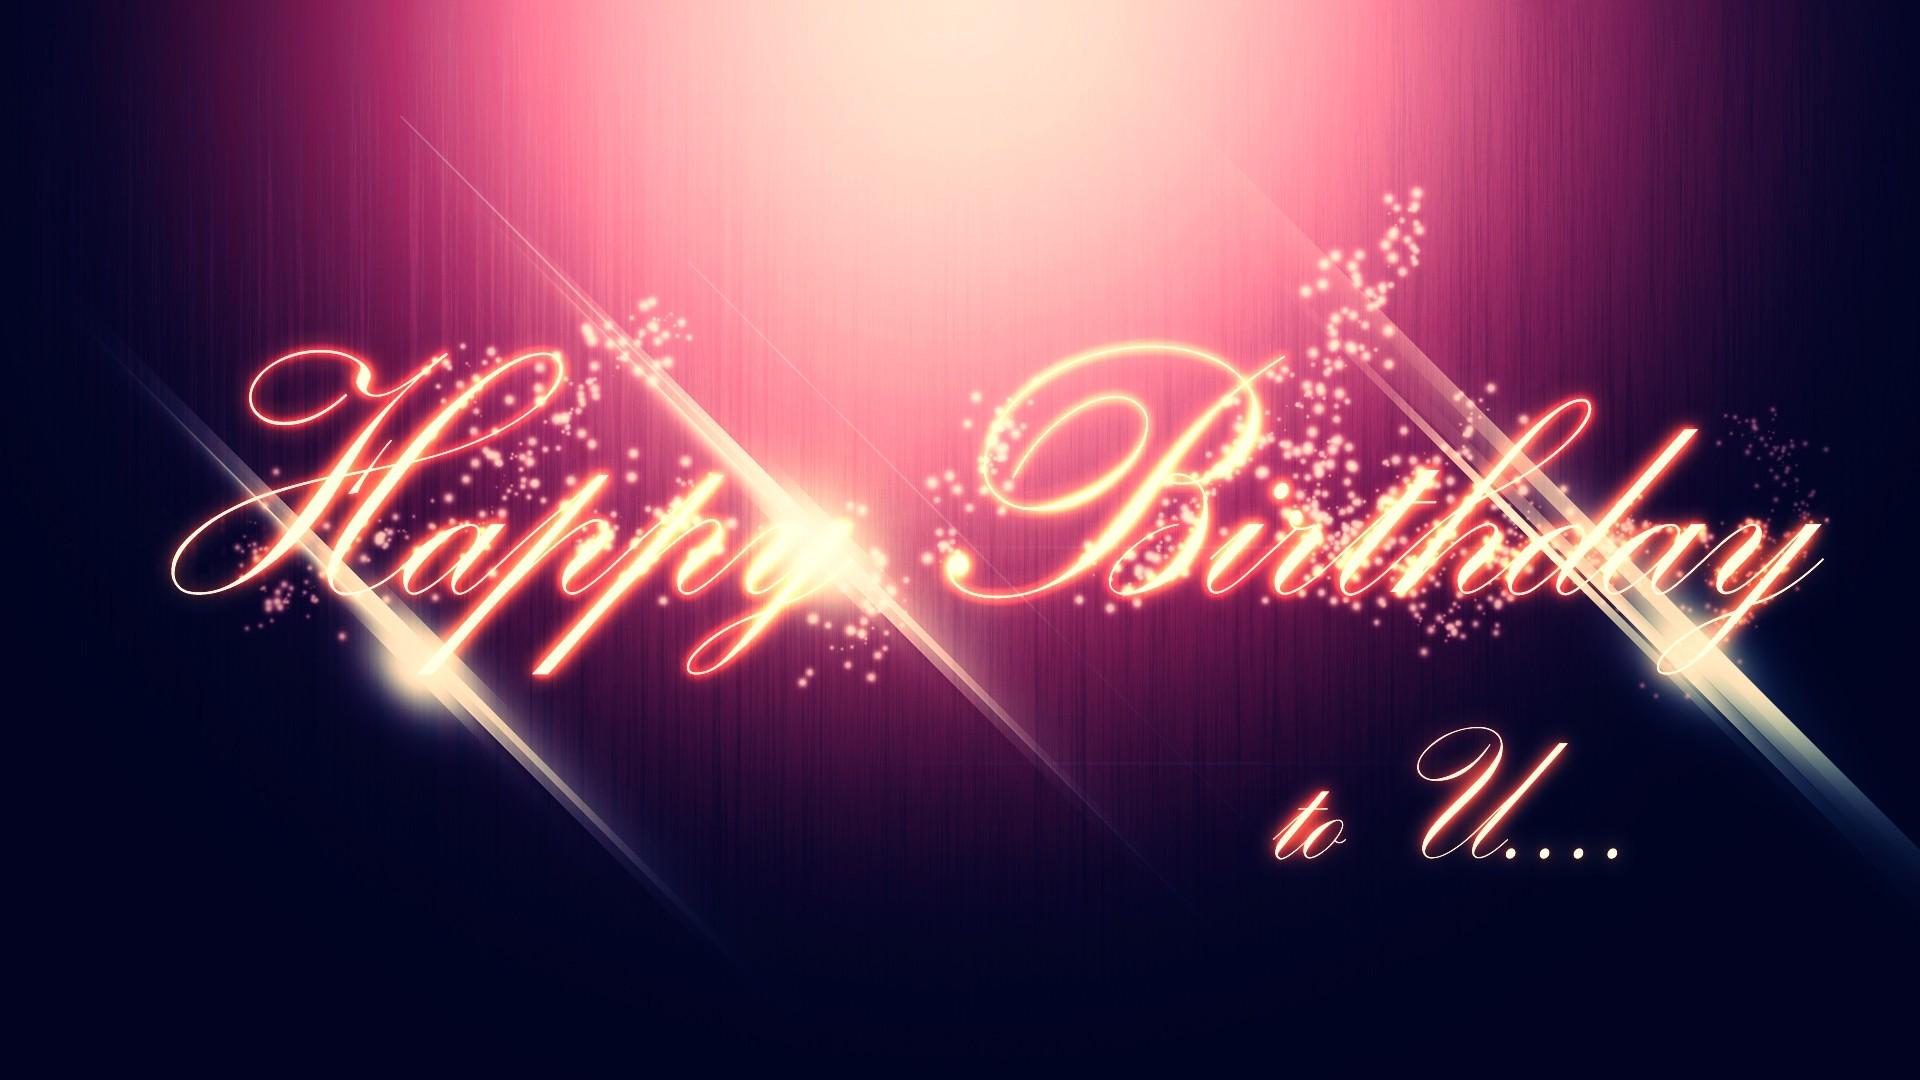 Happy birthday animation Happy birthday animation Happy birthday 1920x1080